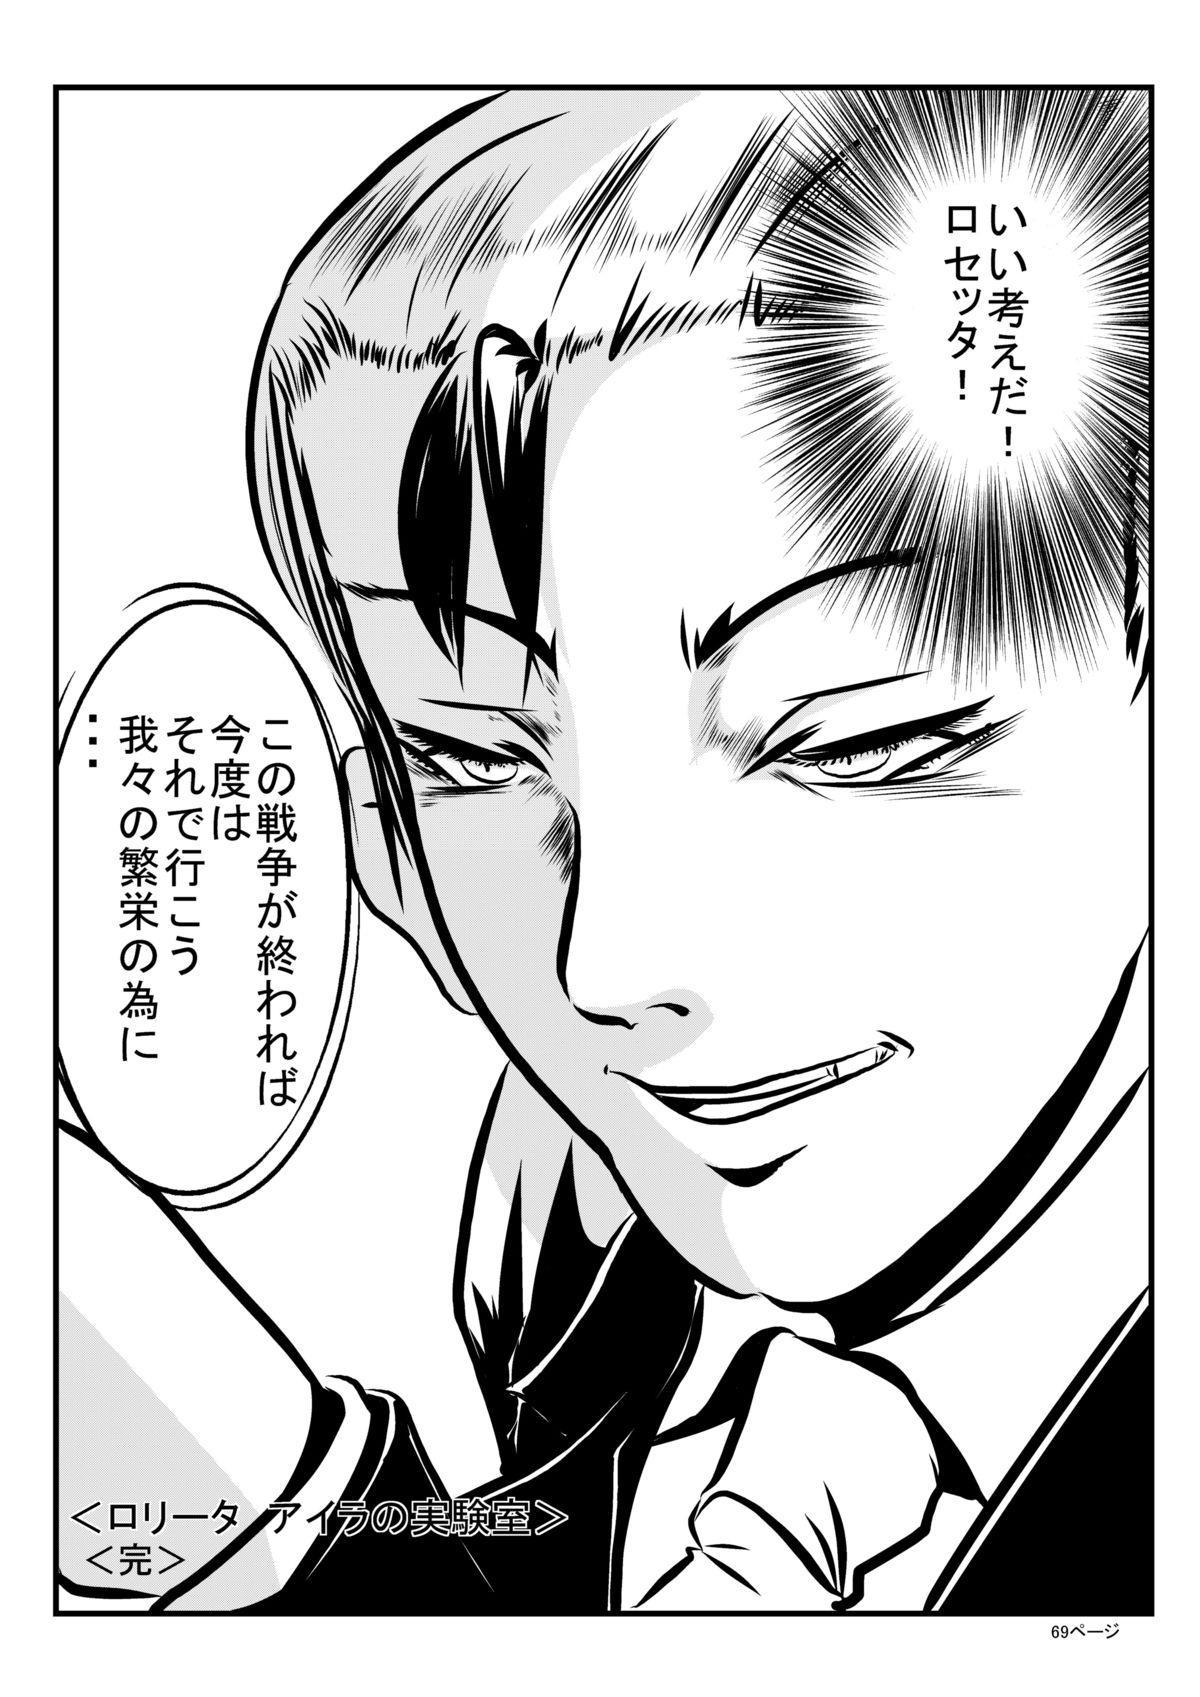 Loli Type no Jikkensitsu 67